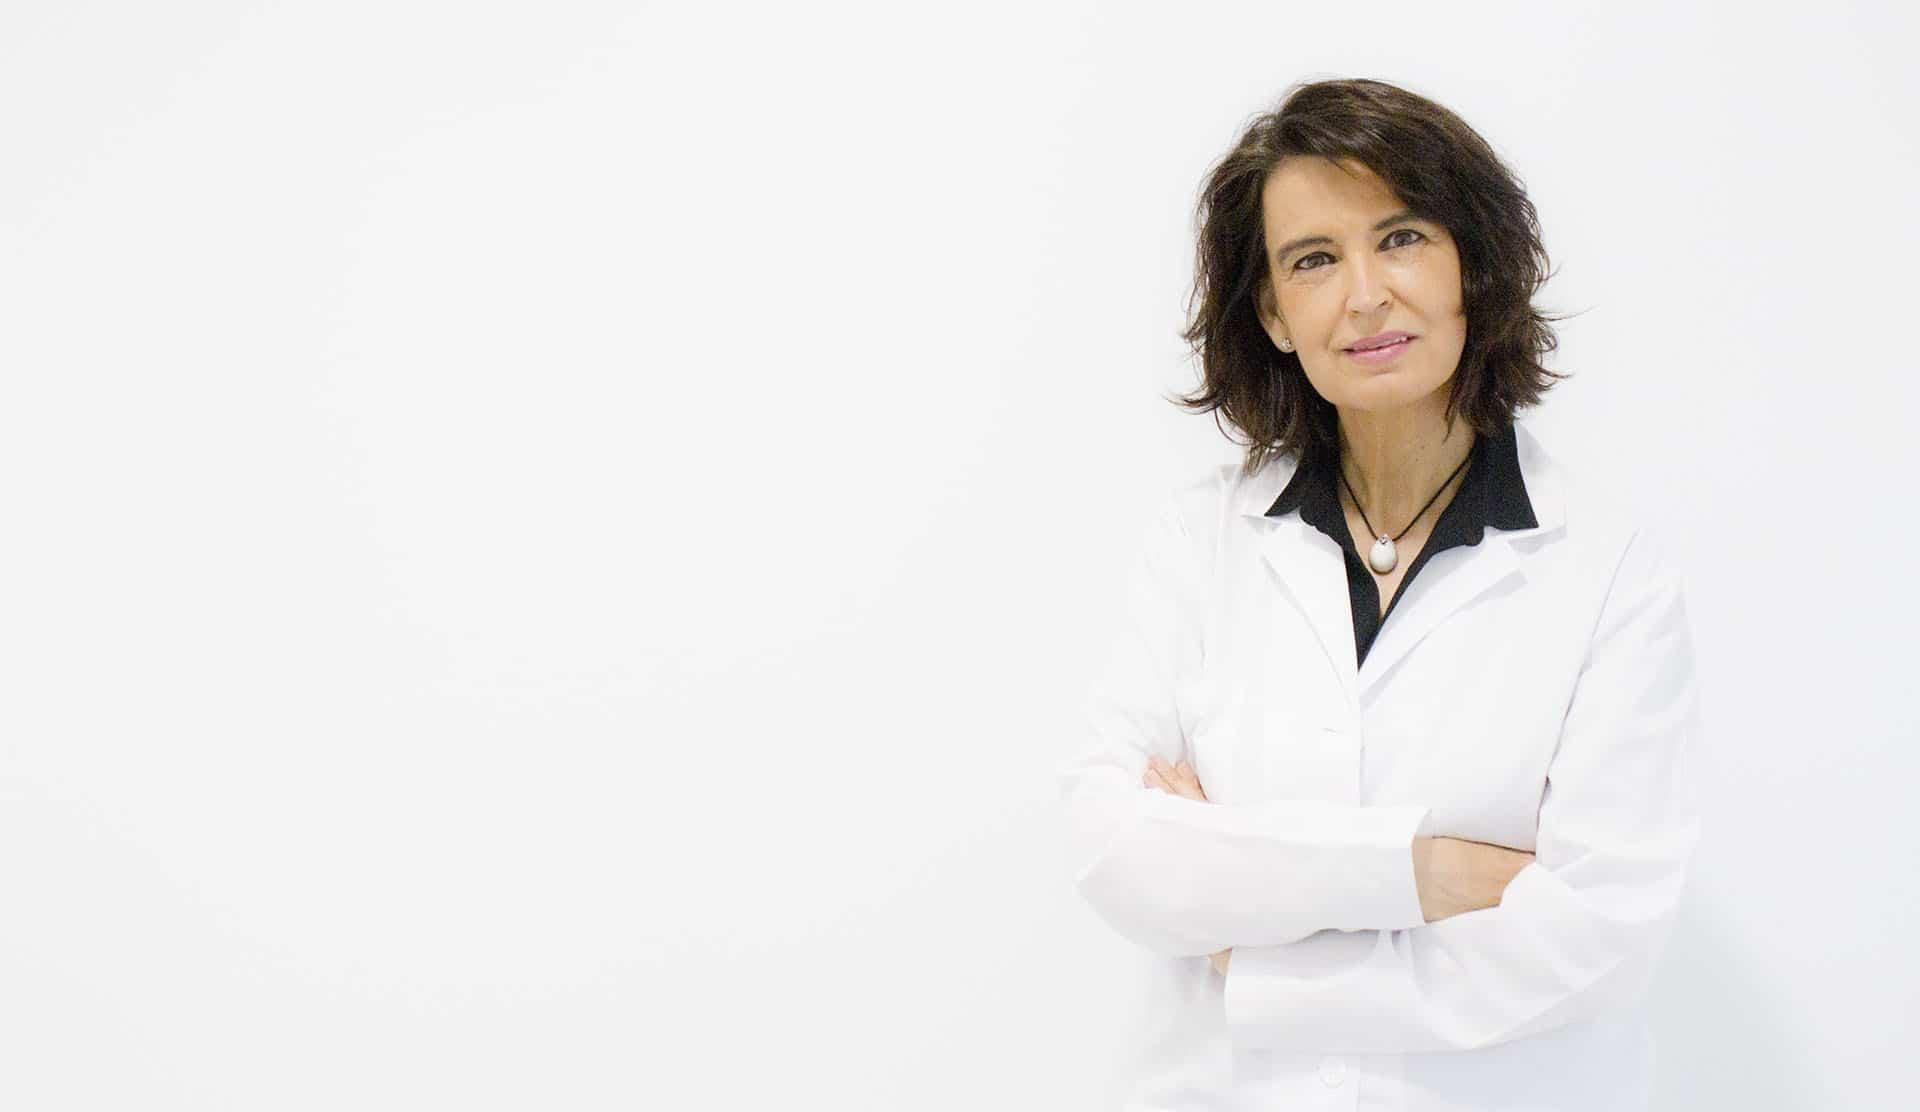 Dra. Ángela Valiente